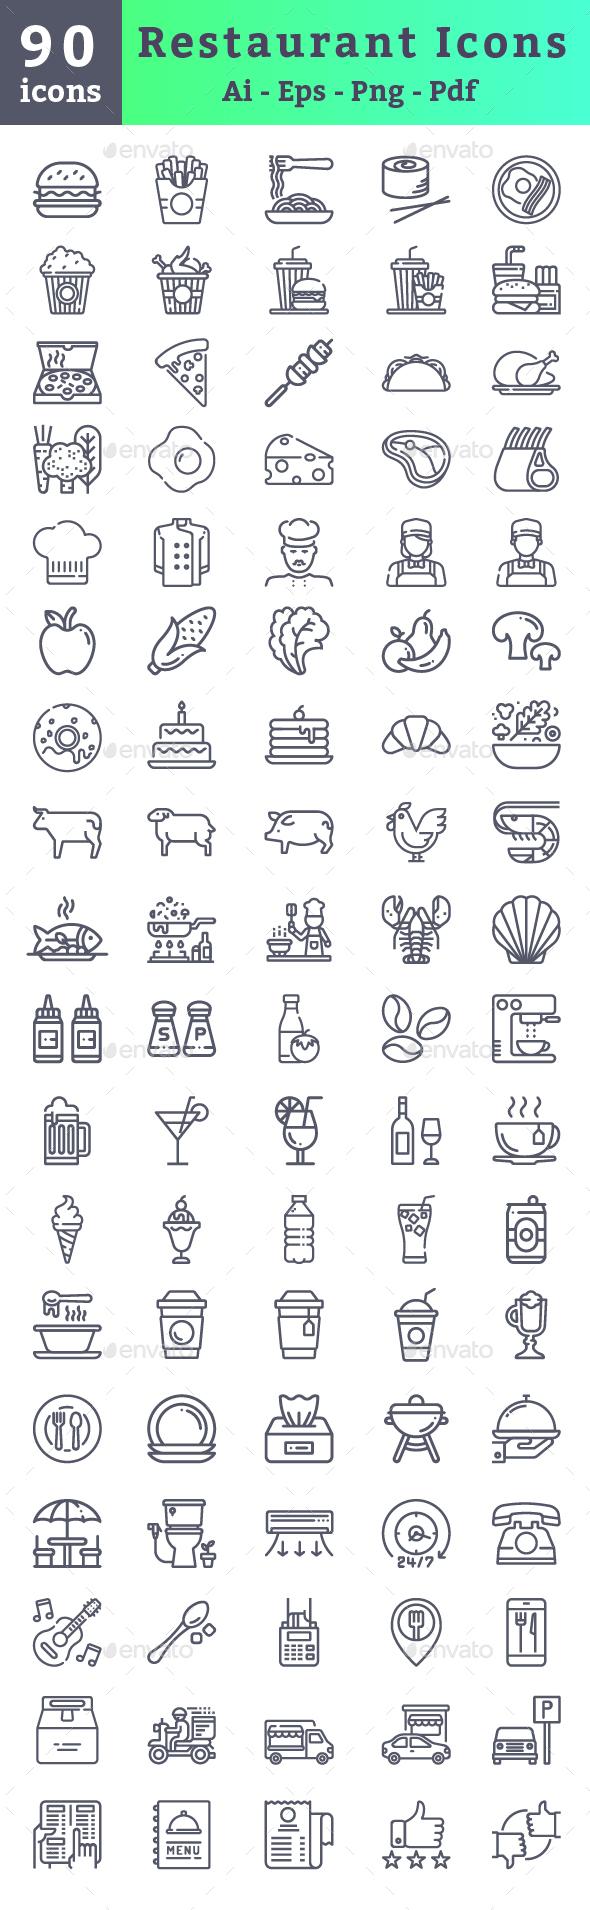 Restaurant Icons - Icons